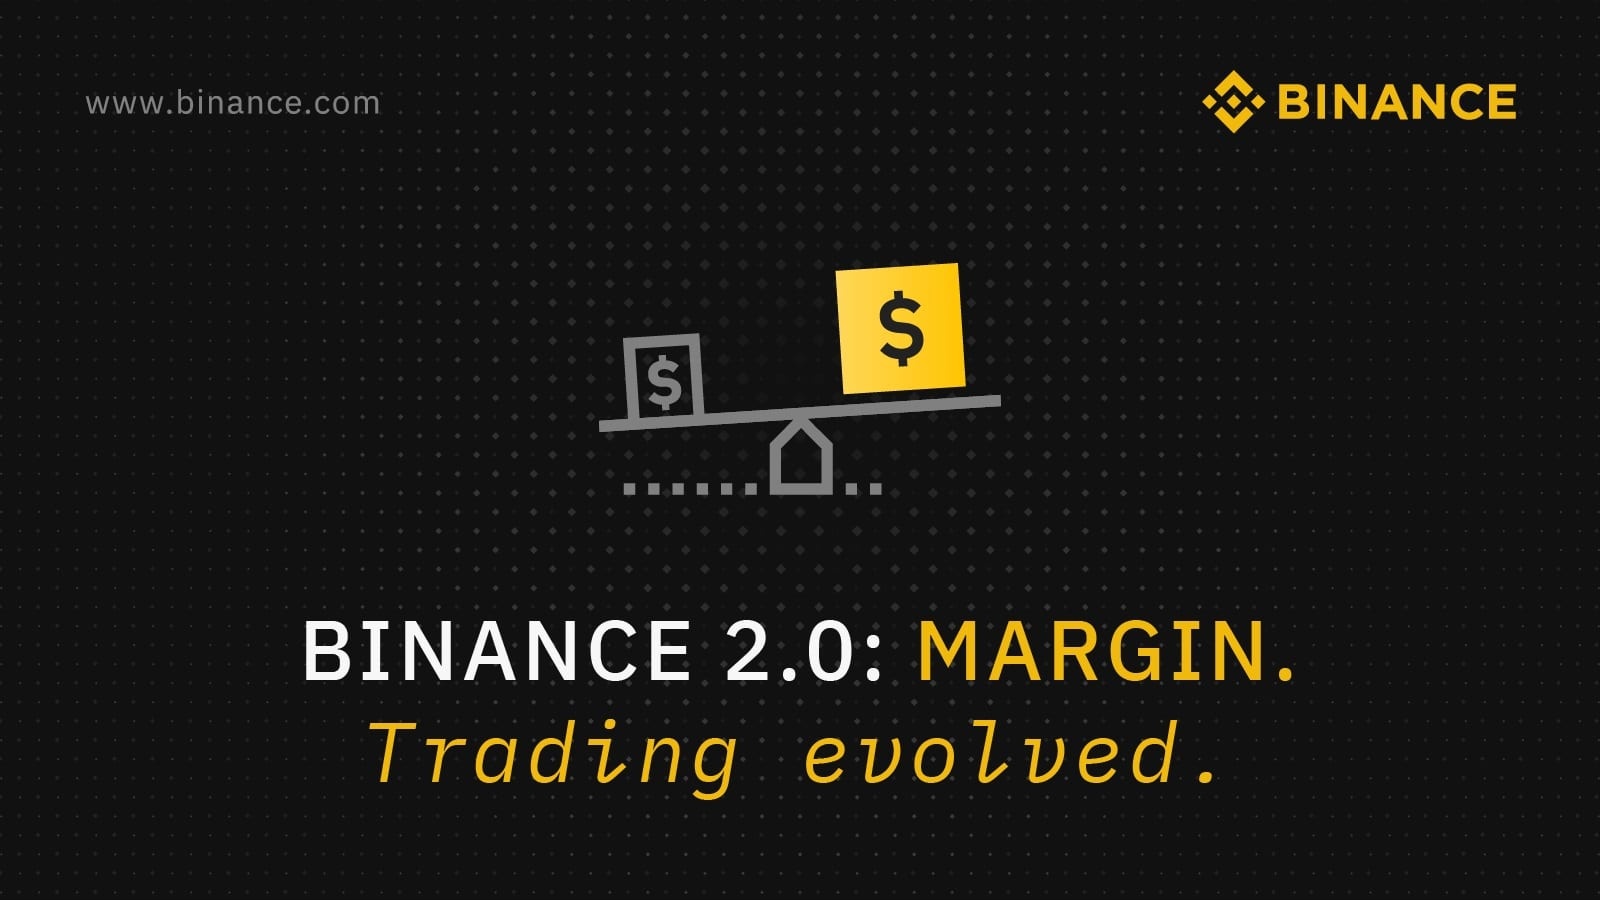 Binance 2.0 met margin trading